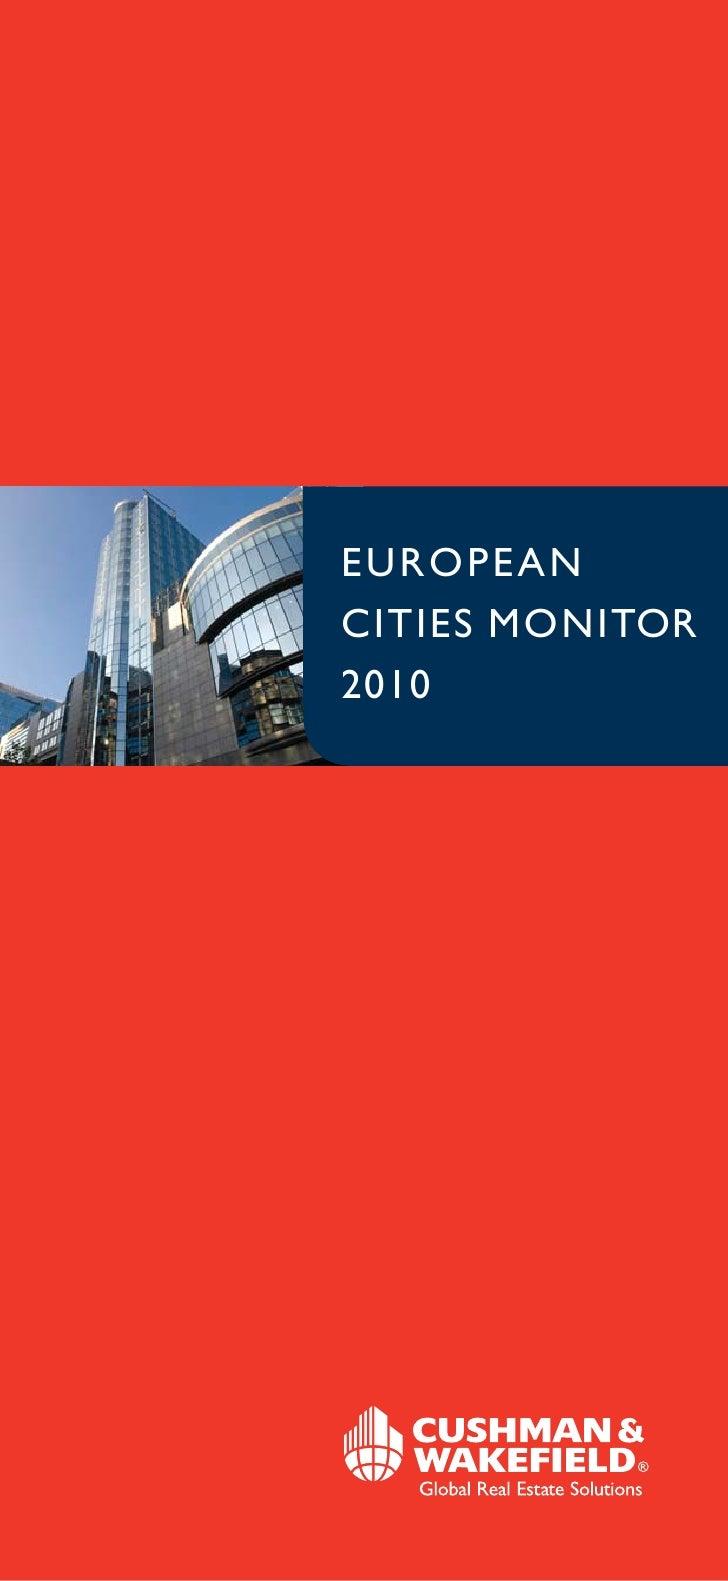 EUROPEAN CITIES MONITOR  2010 Full Version